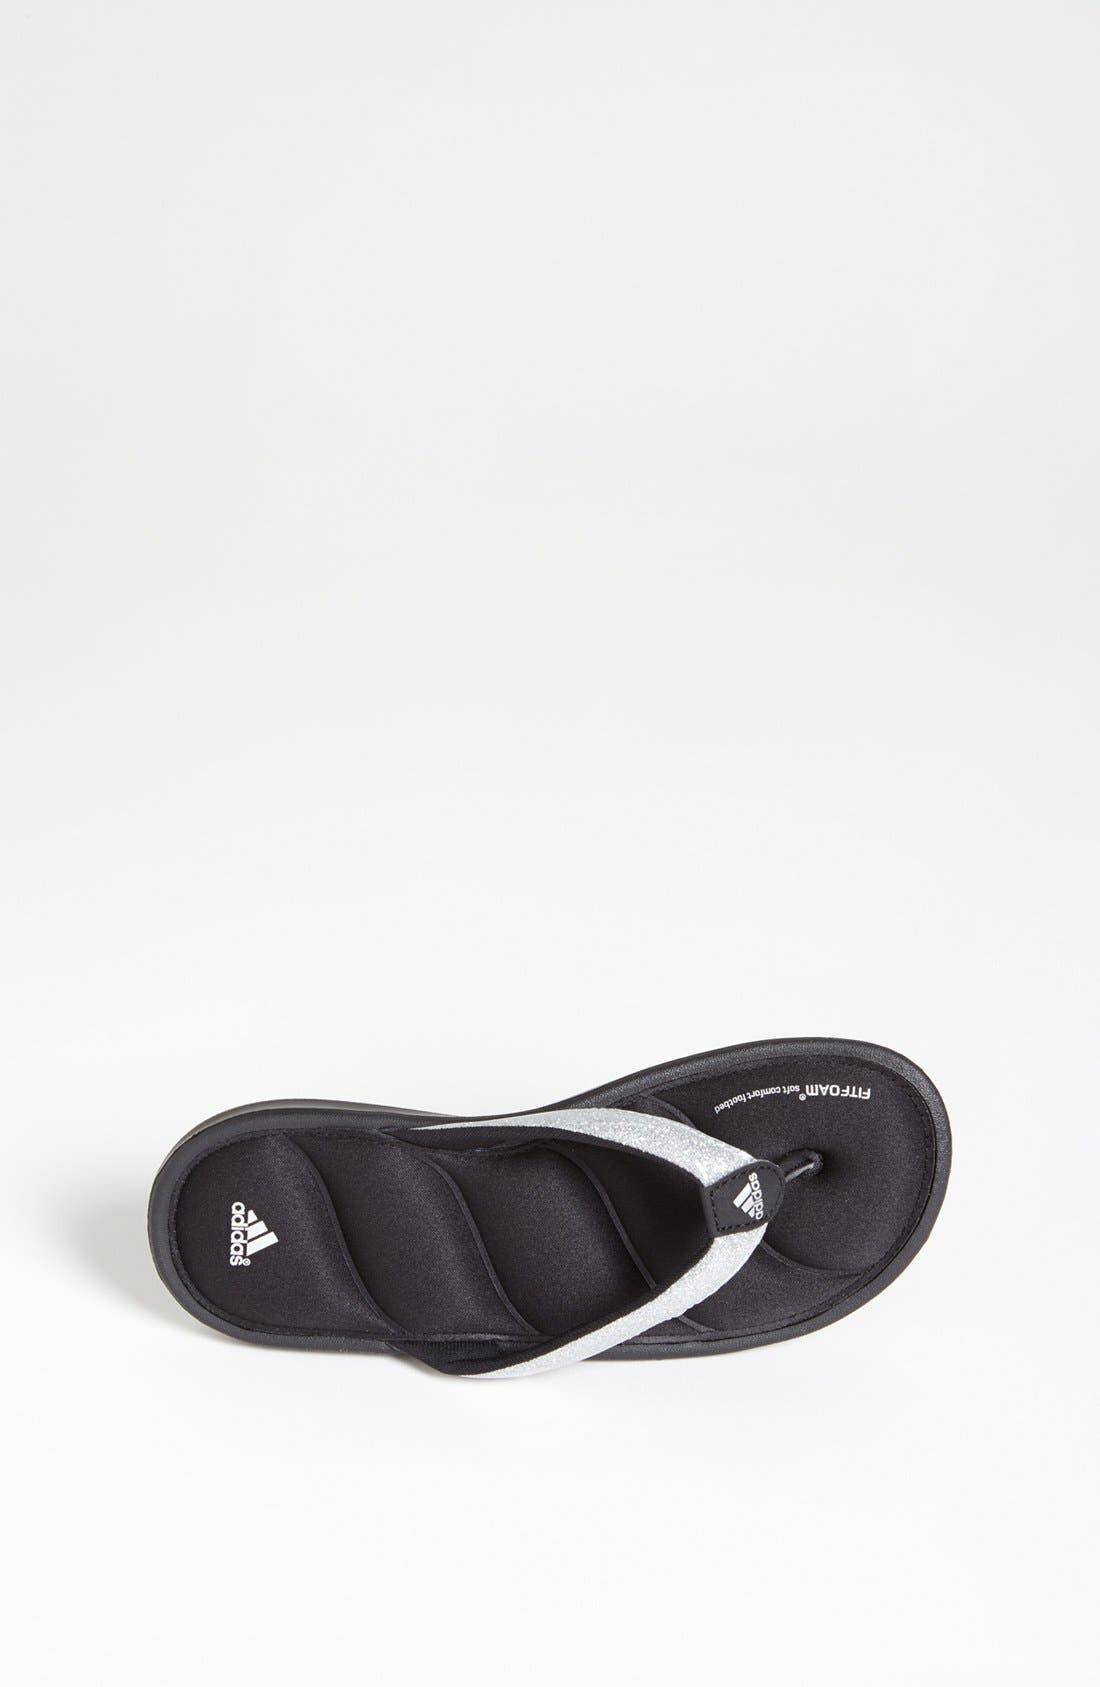 Alternate Image 3  - adidas 'Chillwyanda' Sandal (Toddler, Little Kid & Big Kid)